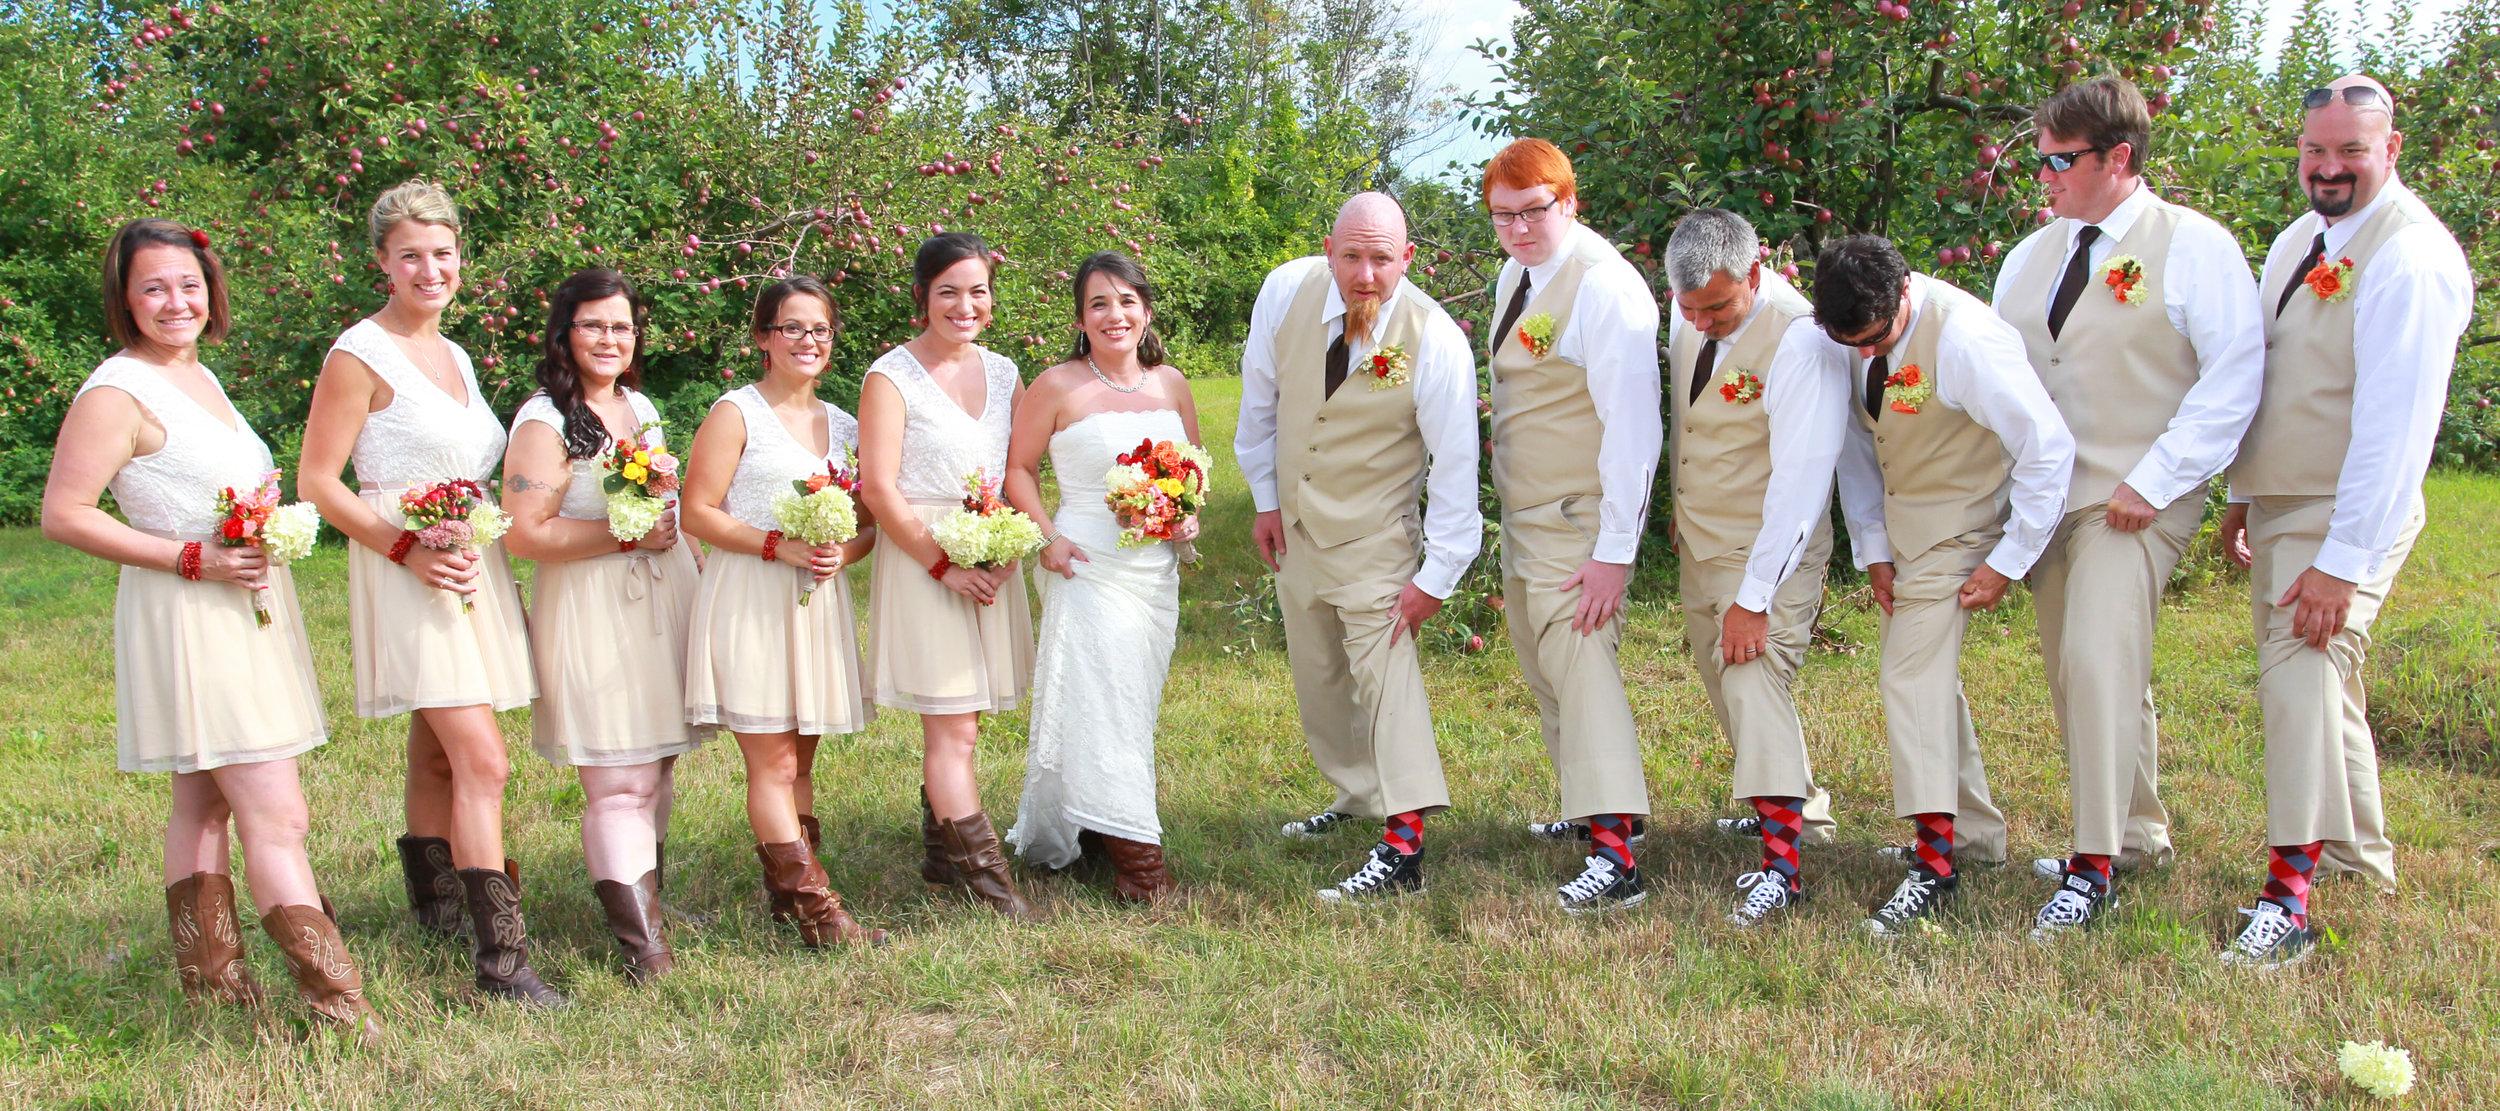 winnepesaukee wedding photography